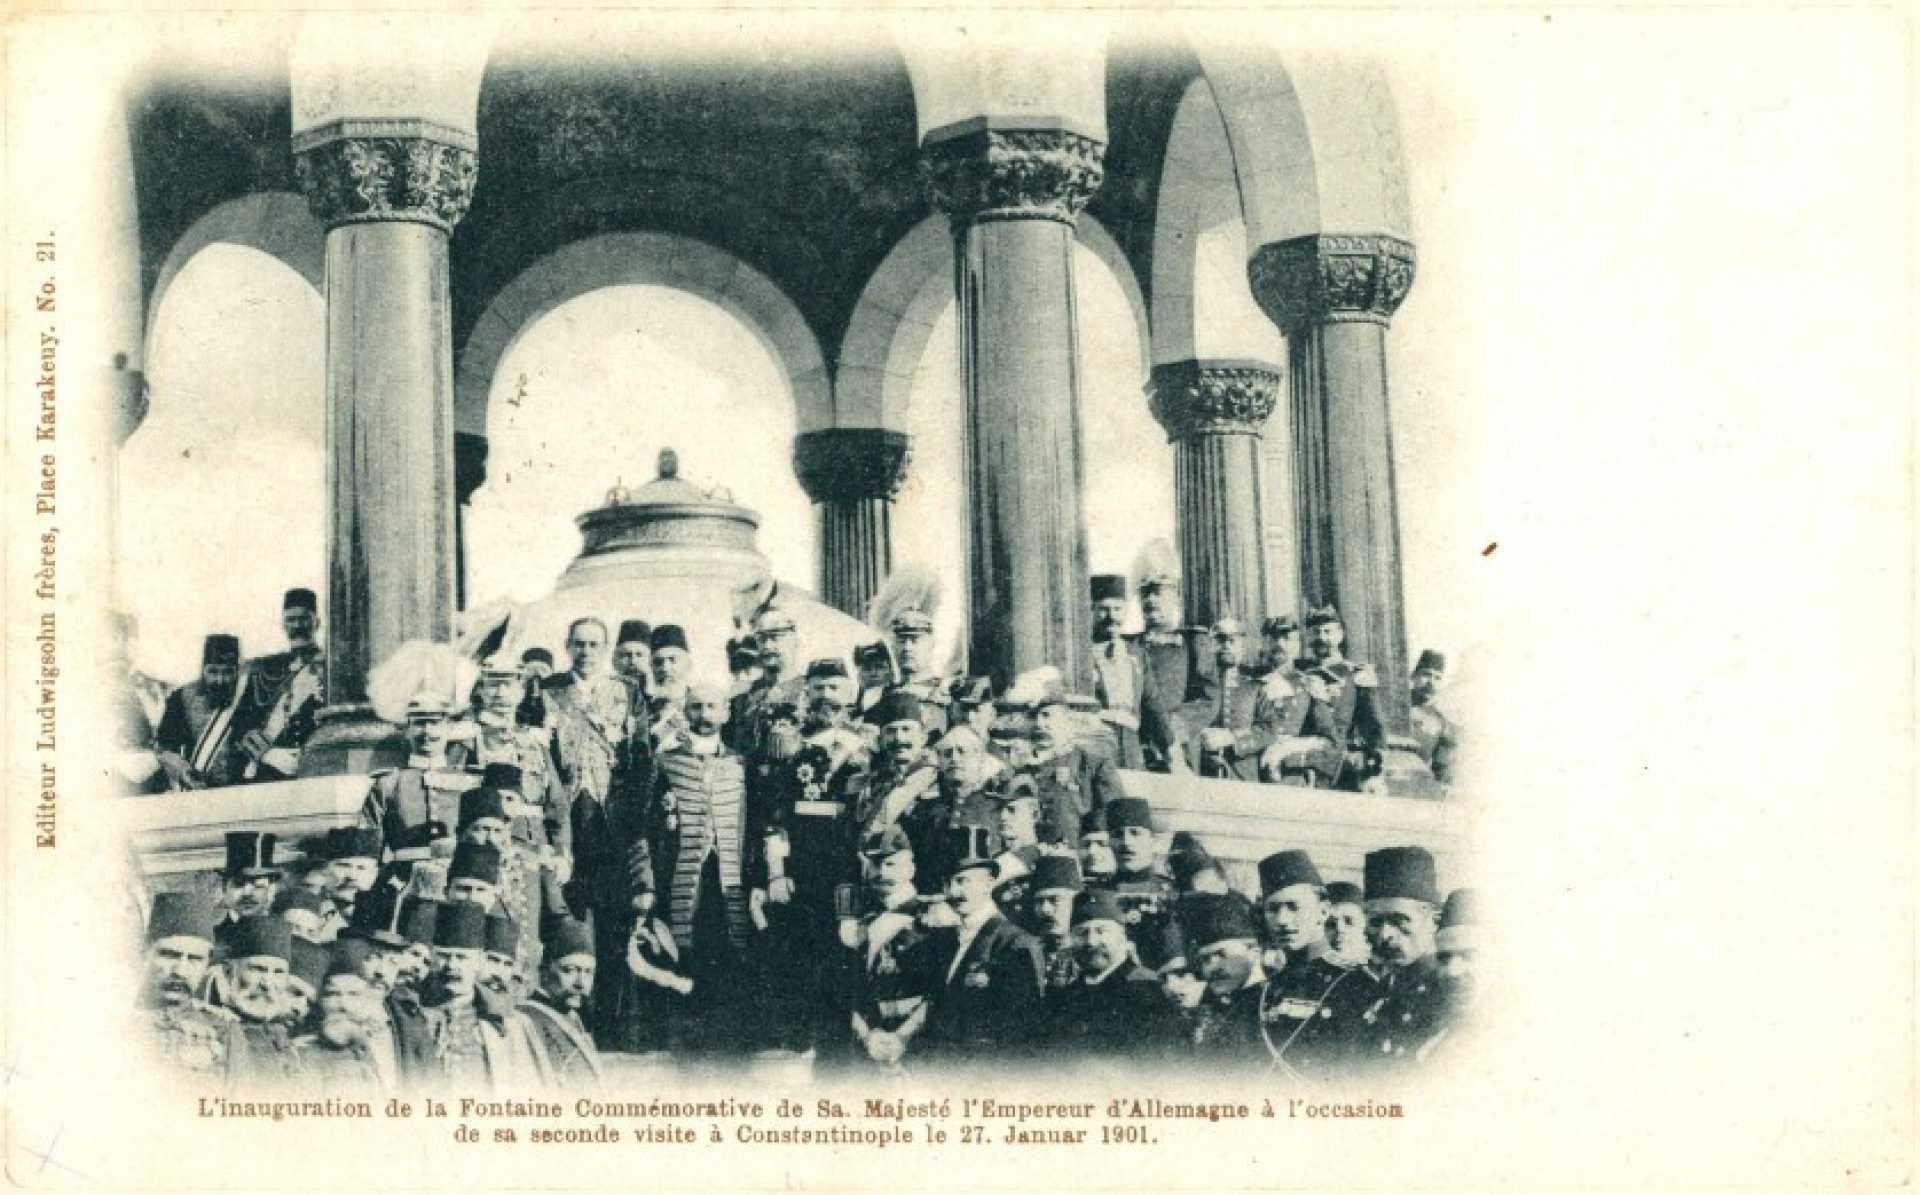 L'inauguration de la Fontaine Commemorative de Sa. Majeste l'Empereur d'Allemagne a l'occasion de sa seconde visite a Constantinople